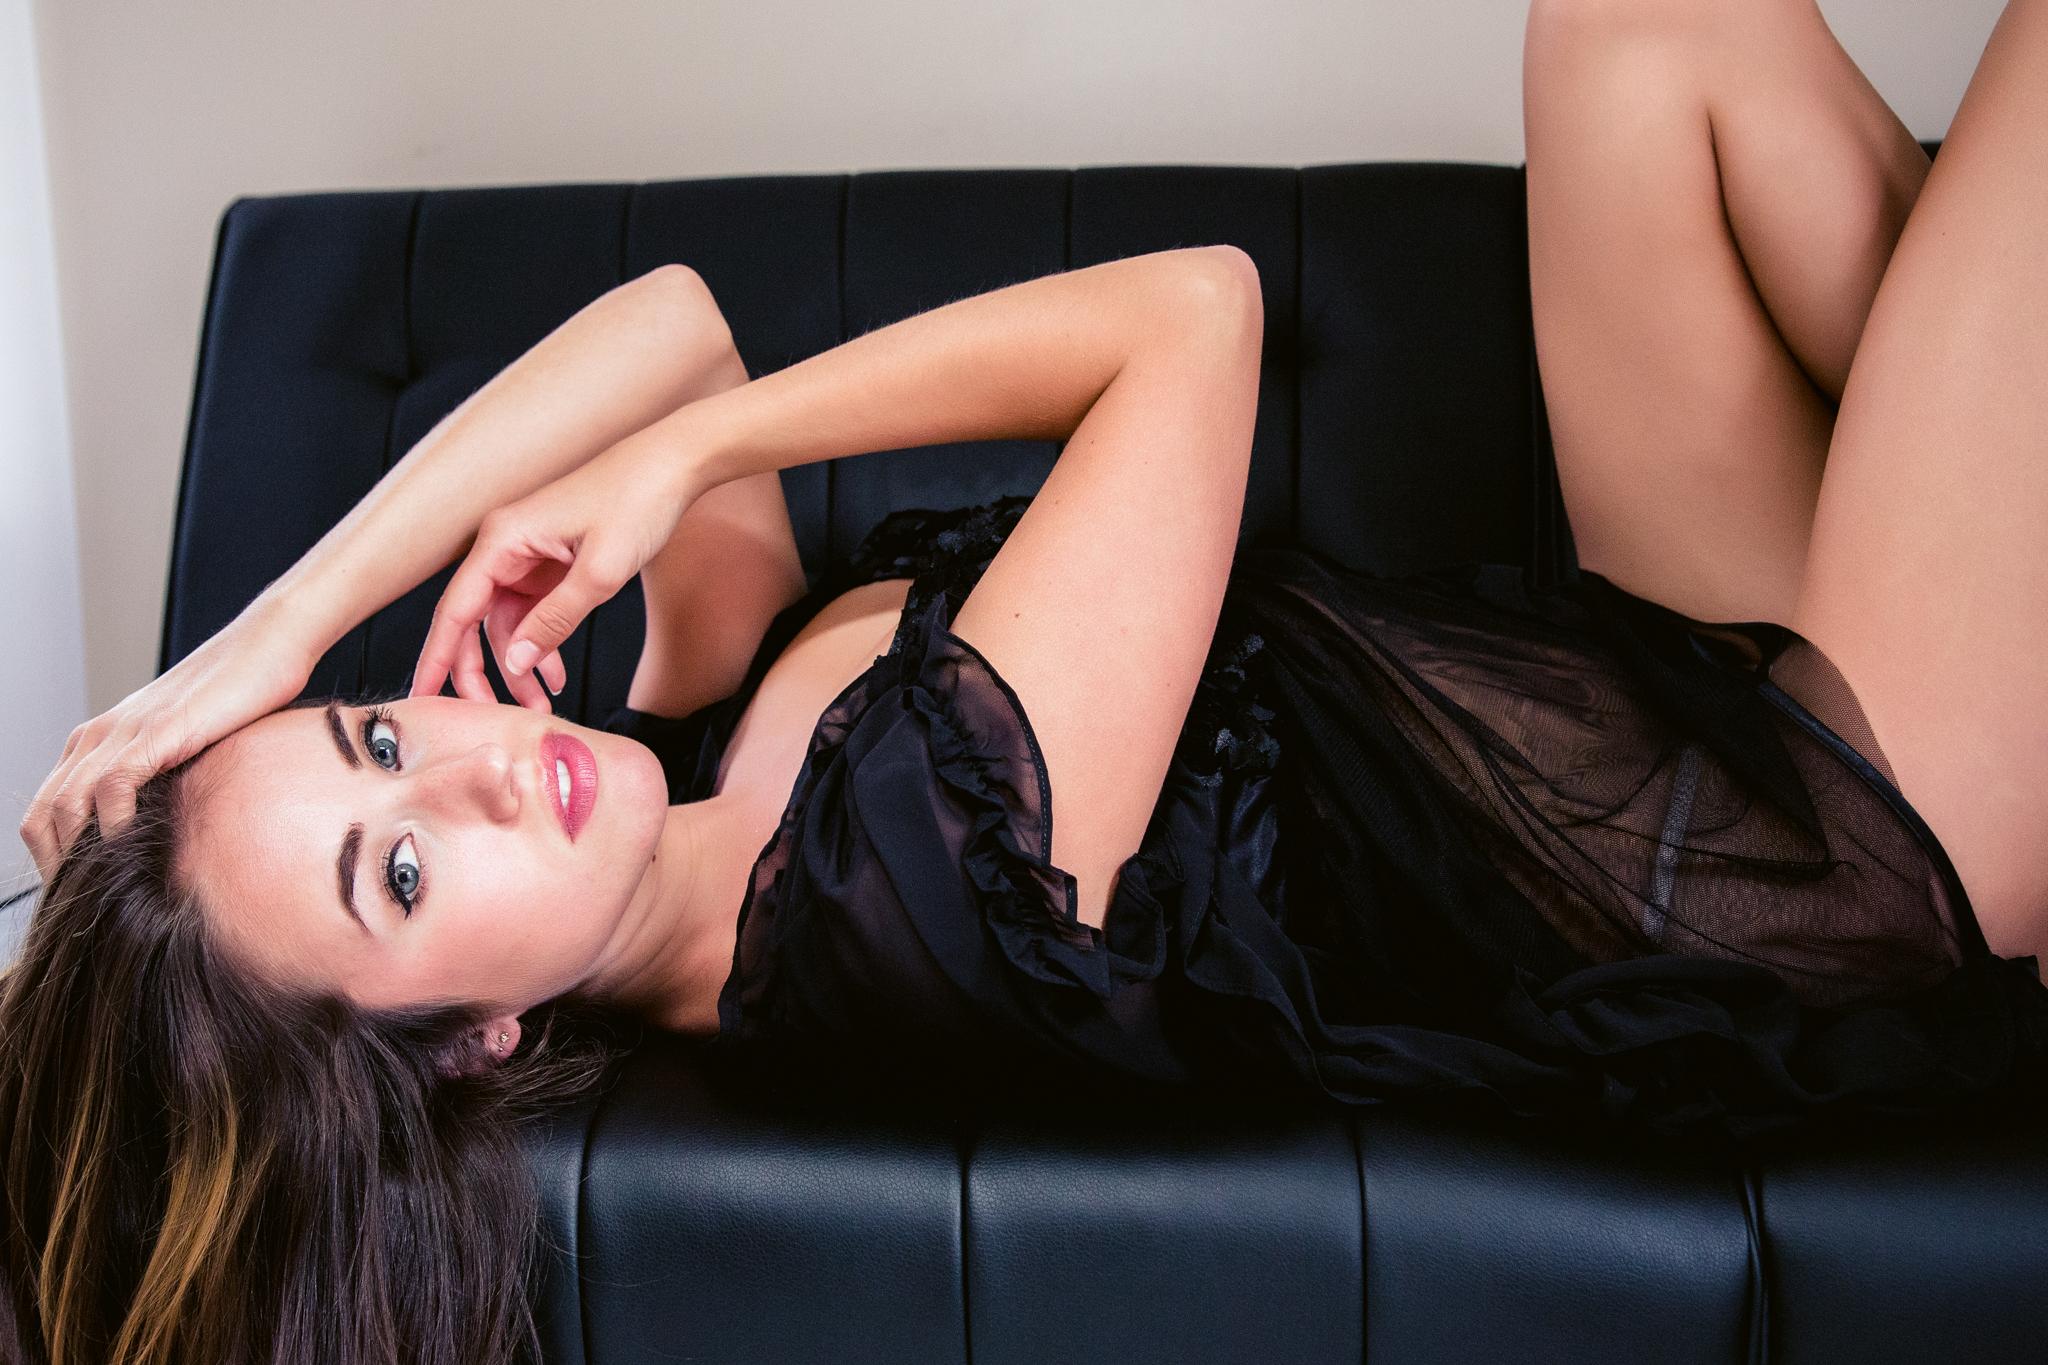 Sexy dark lingerie boudoir shoot by Boudoir by Marie in Charleston, SC.